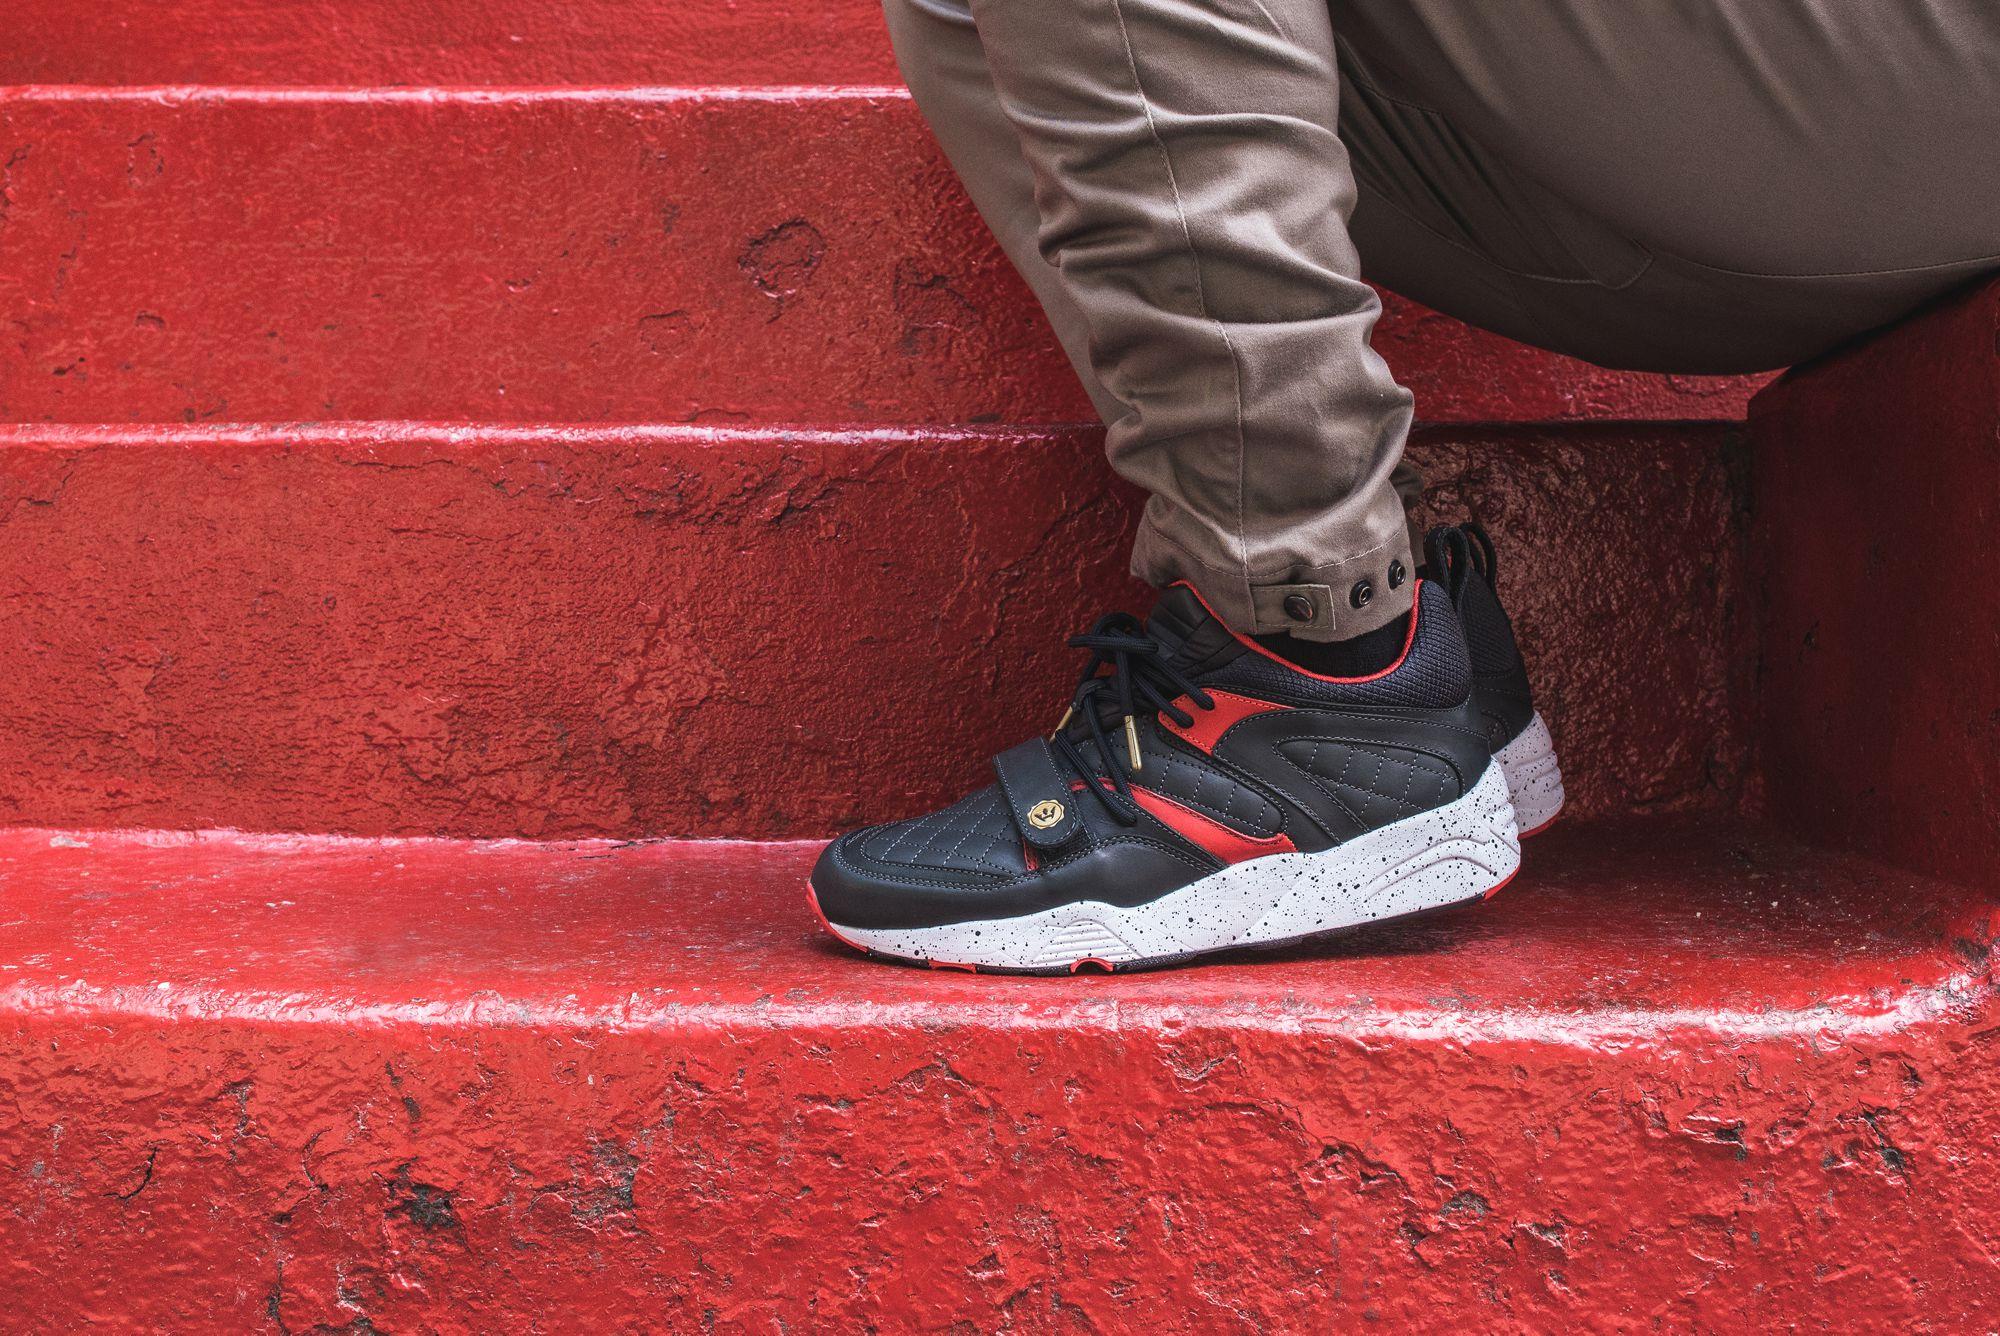 shoe-on-foot-001